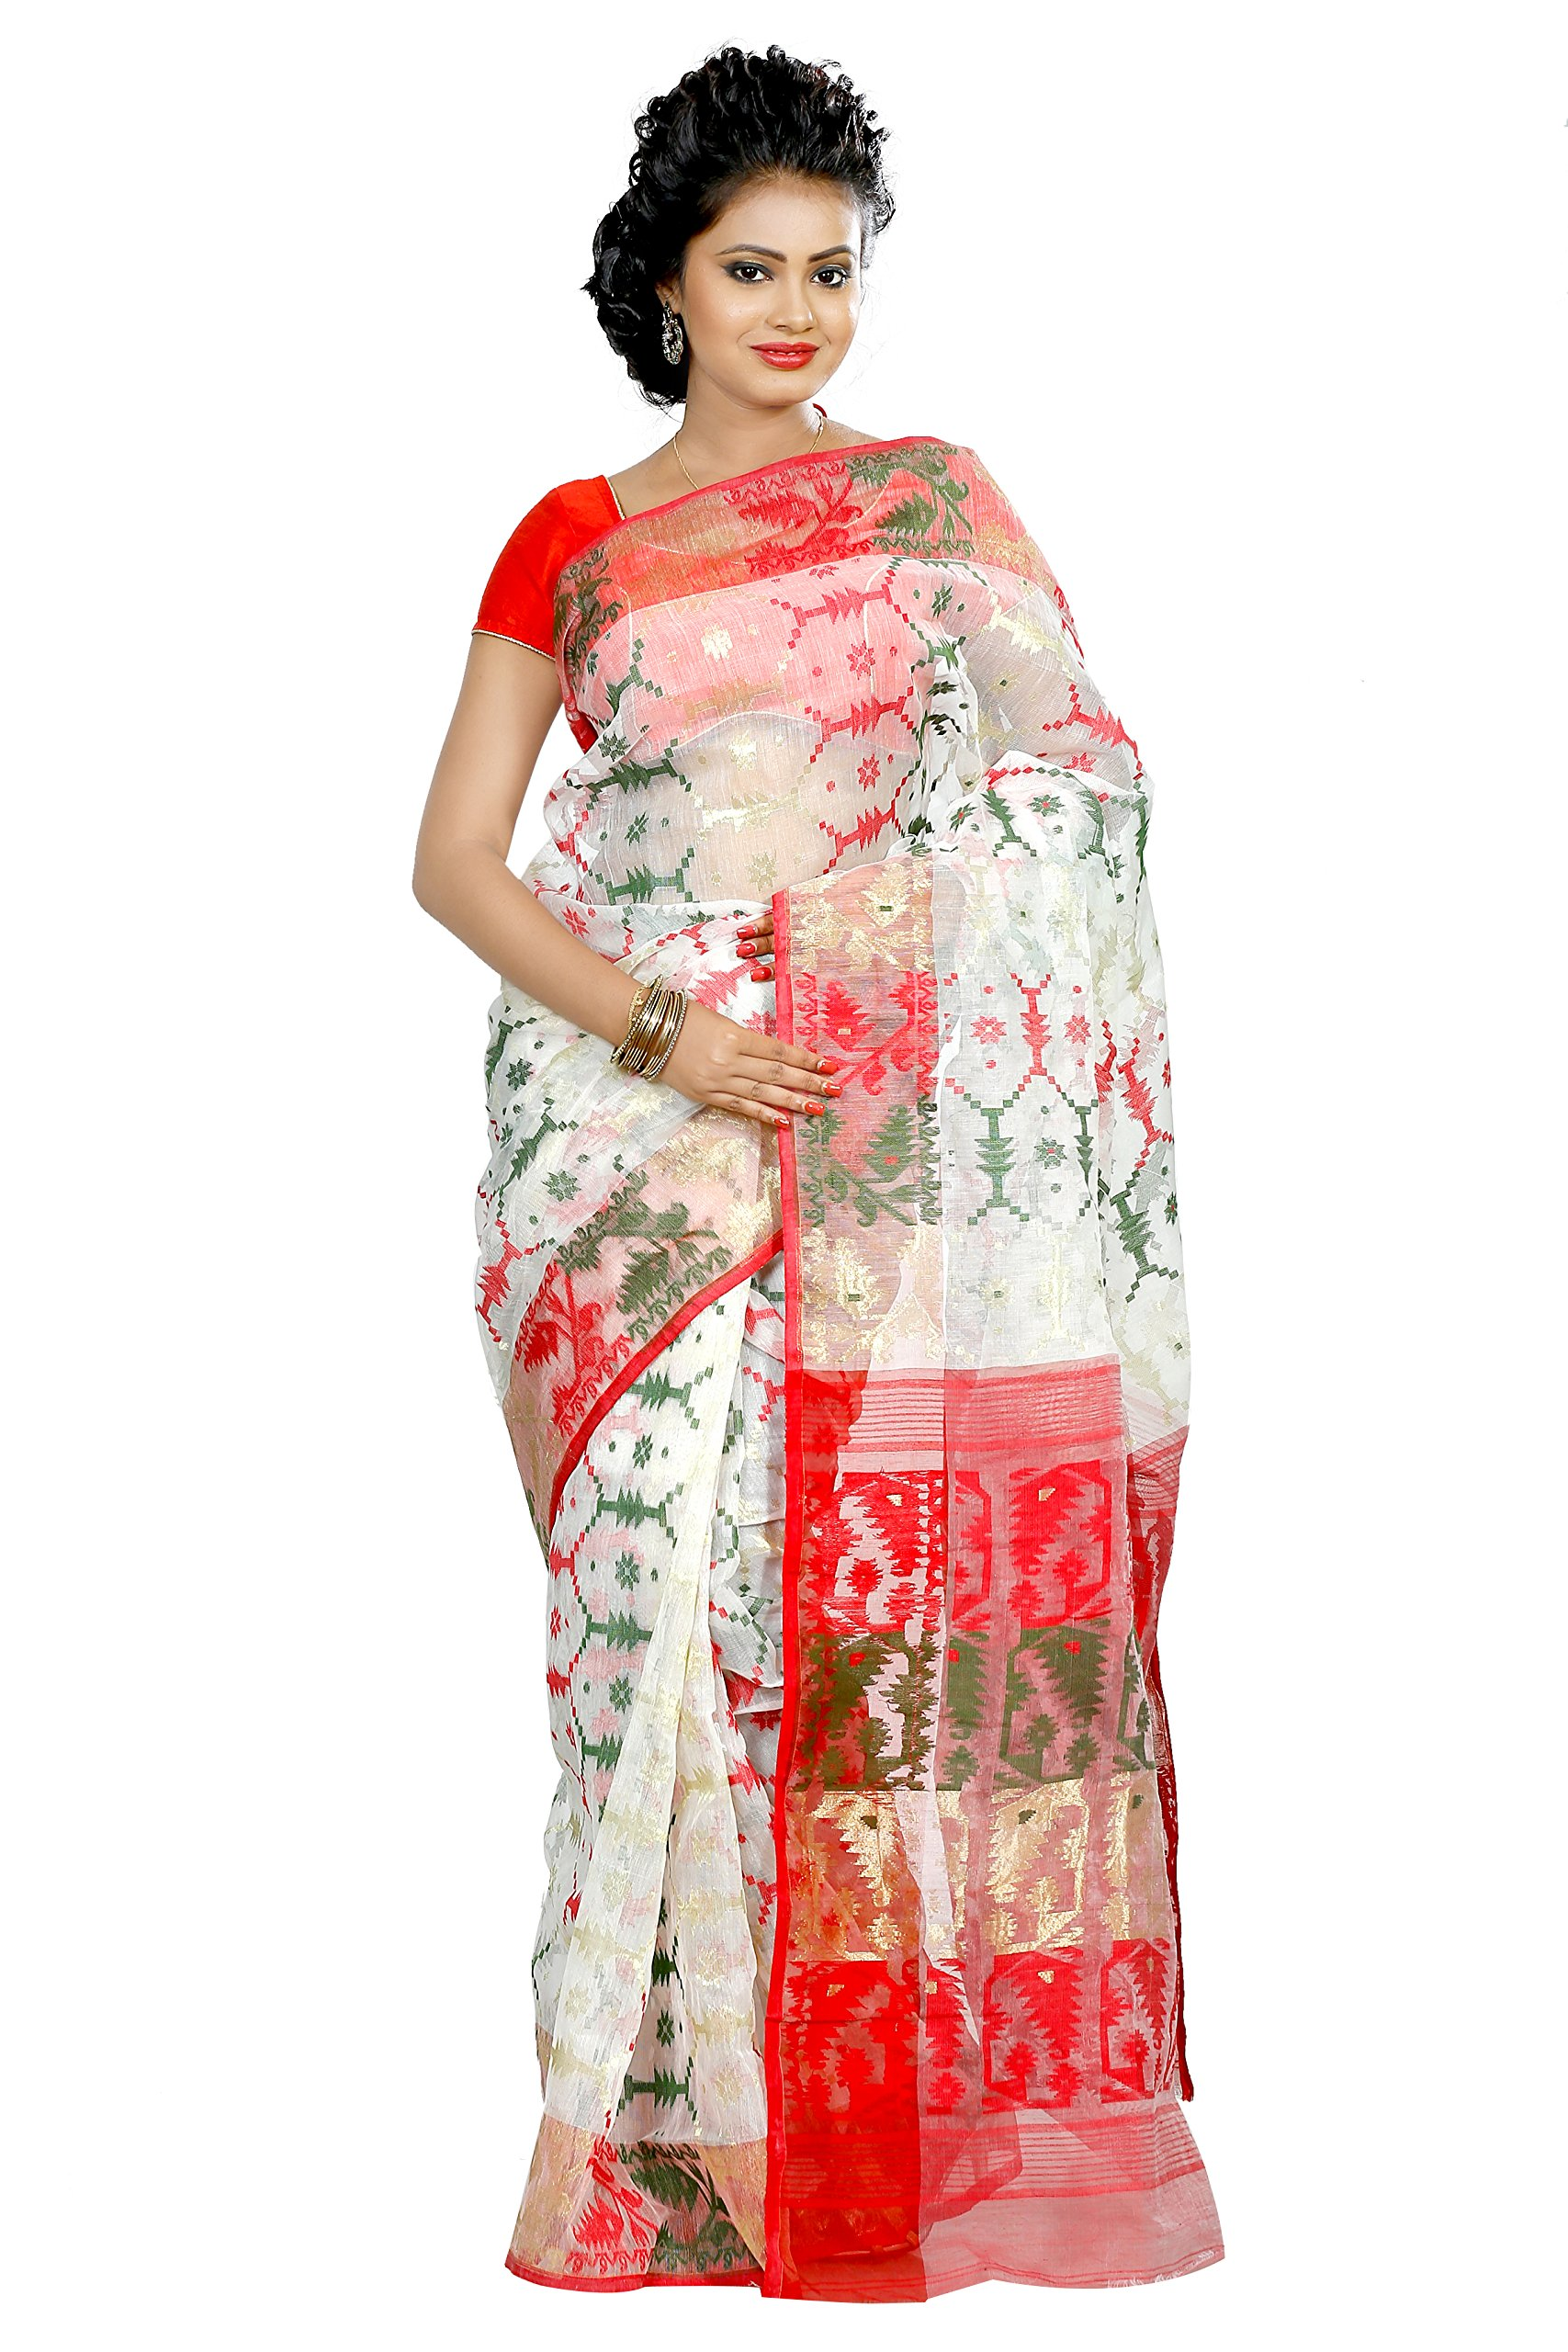 B3Fashion Handloom Traditional Dhakai Jamdani saree